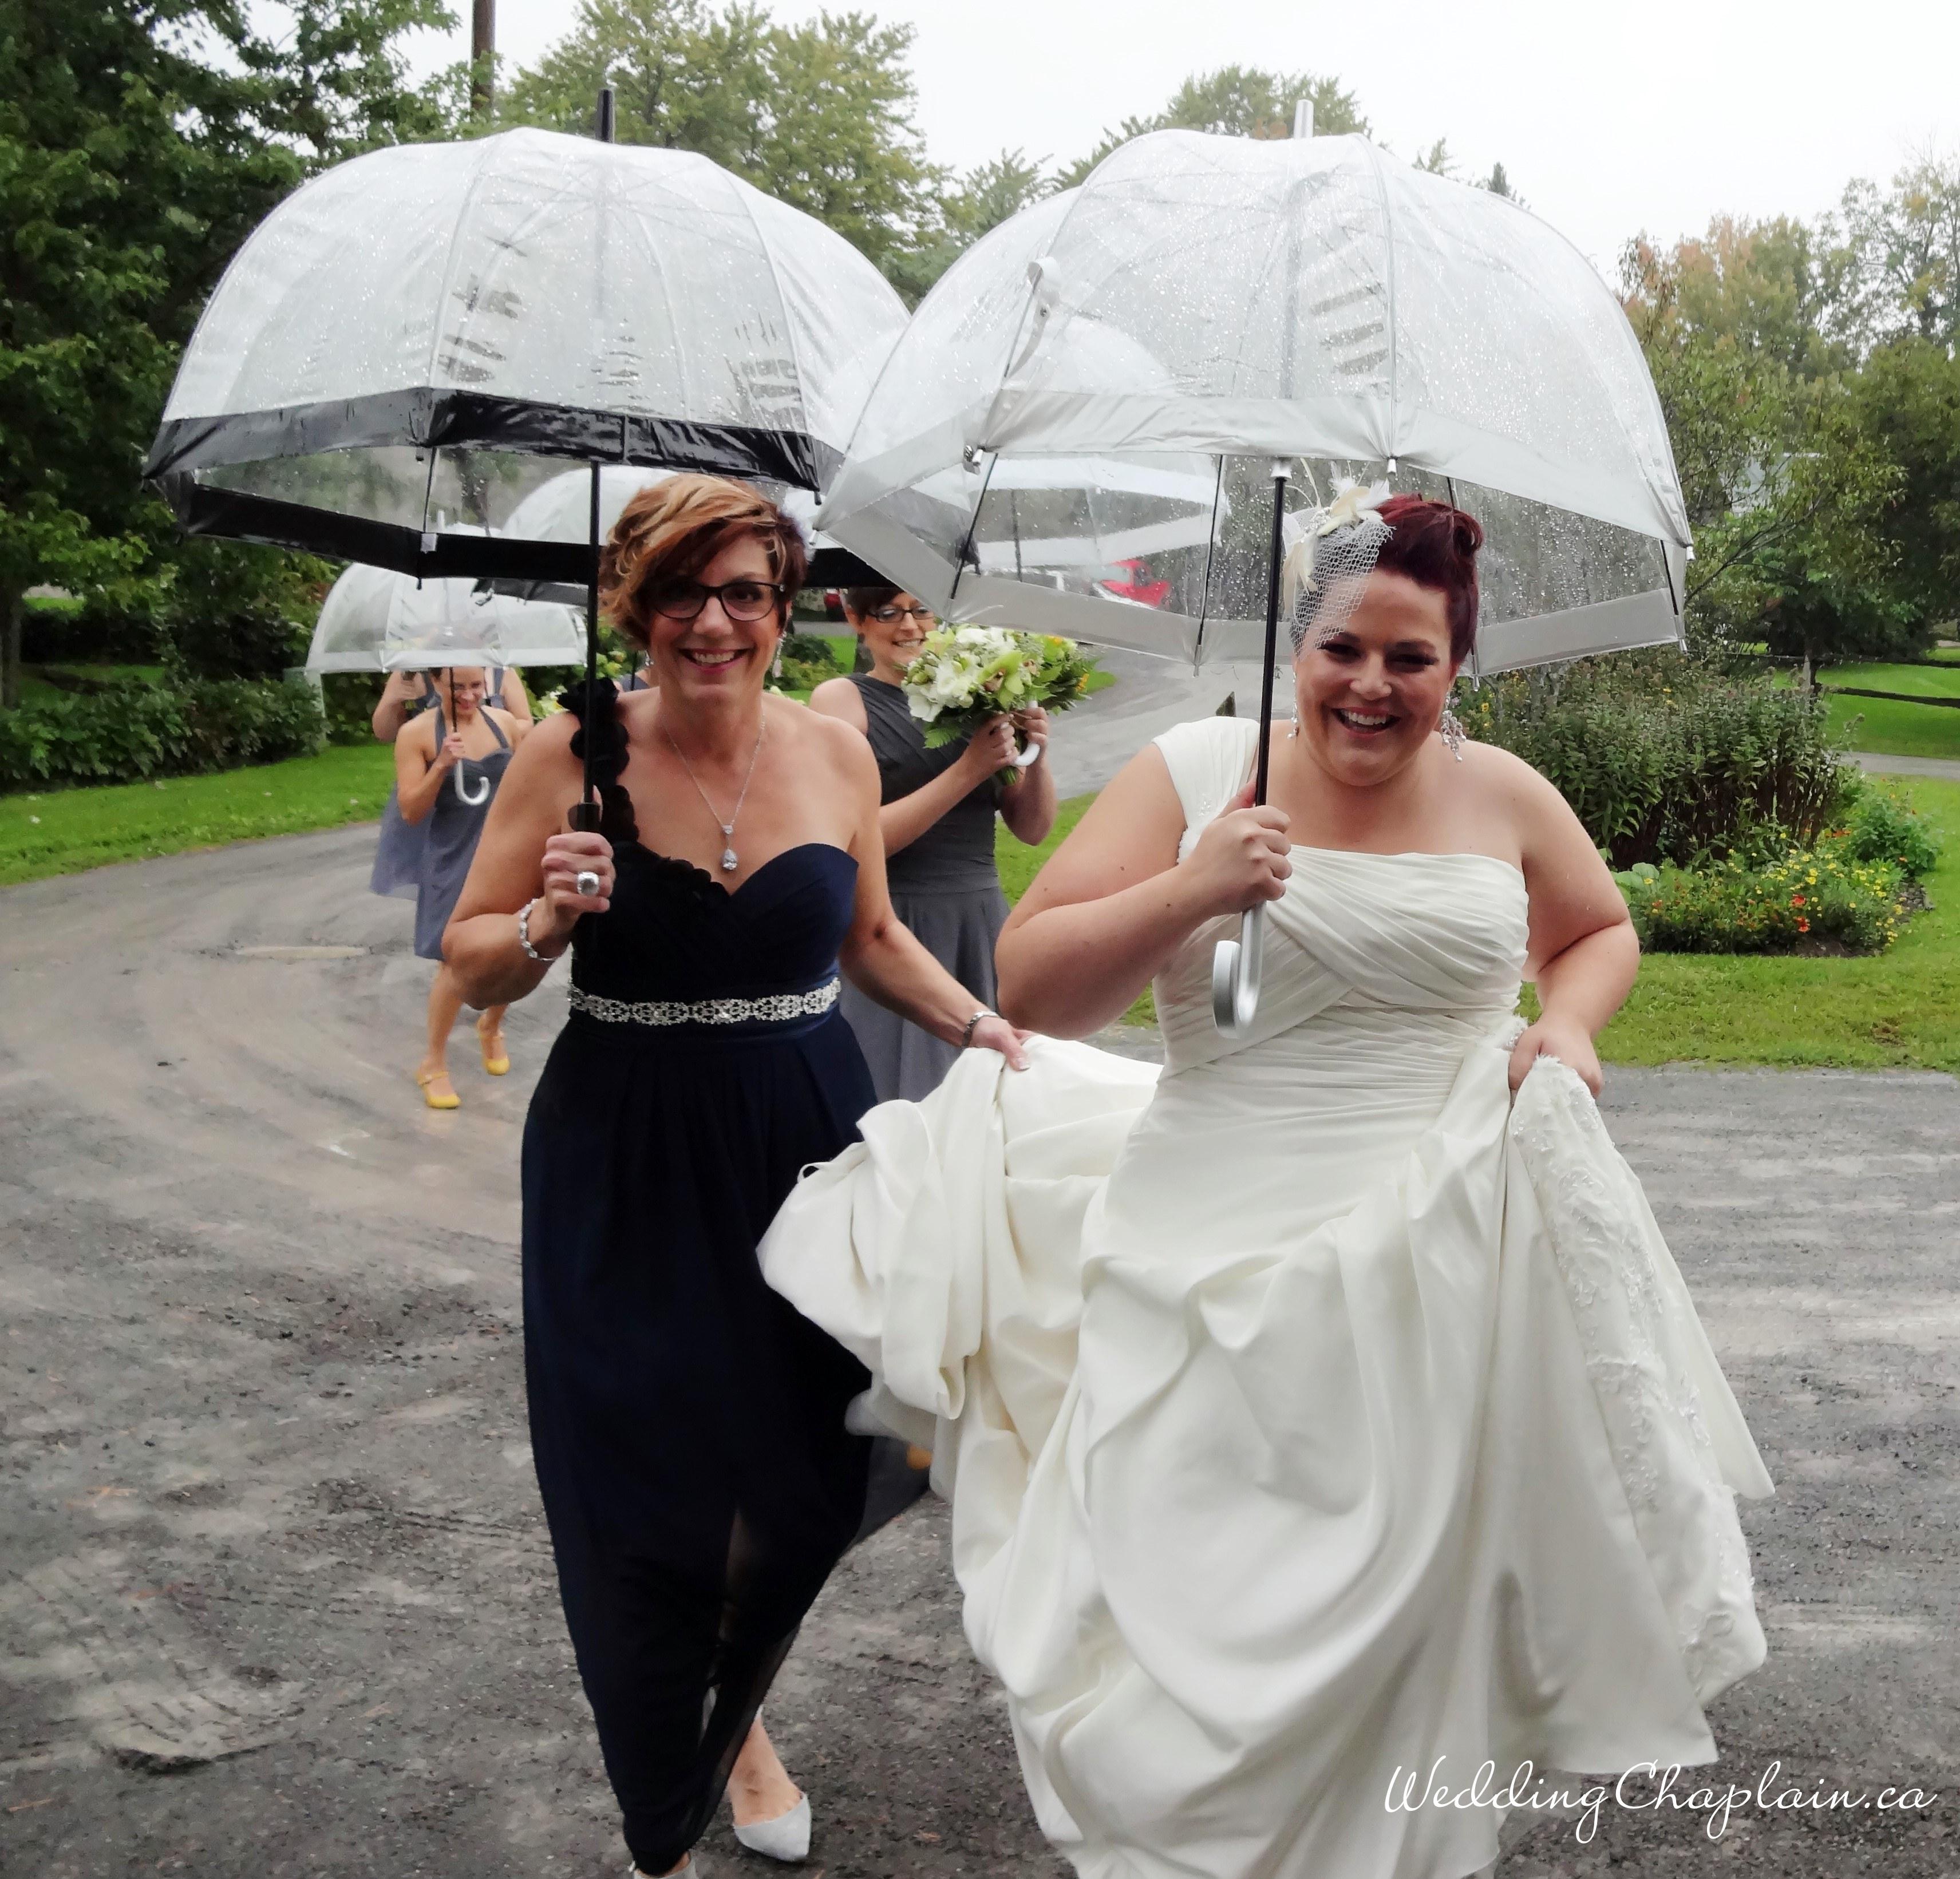 https://www.ottawaweddingmagazine.com/wp-content/uploads/2015/01/martine-in-the-rain.jpg